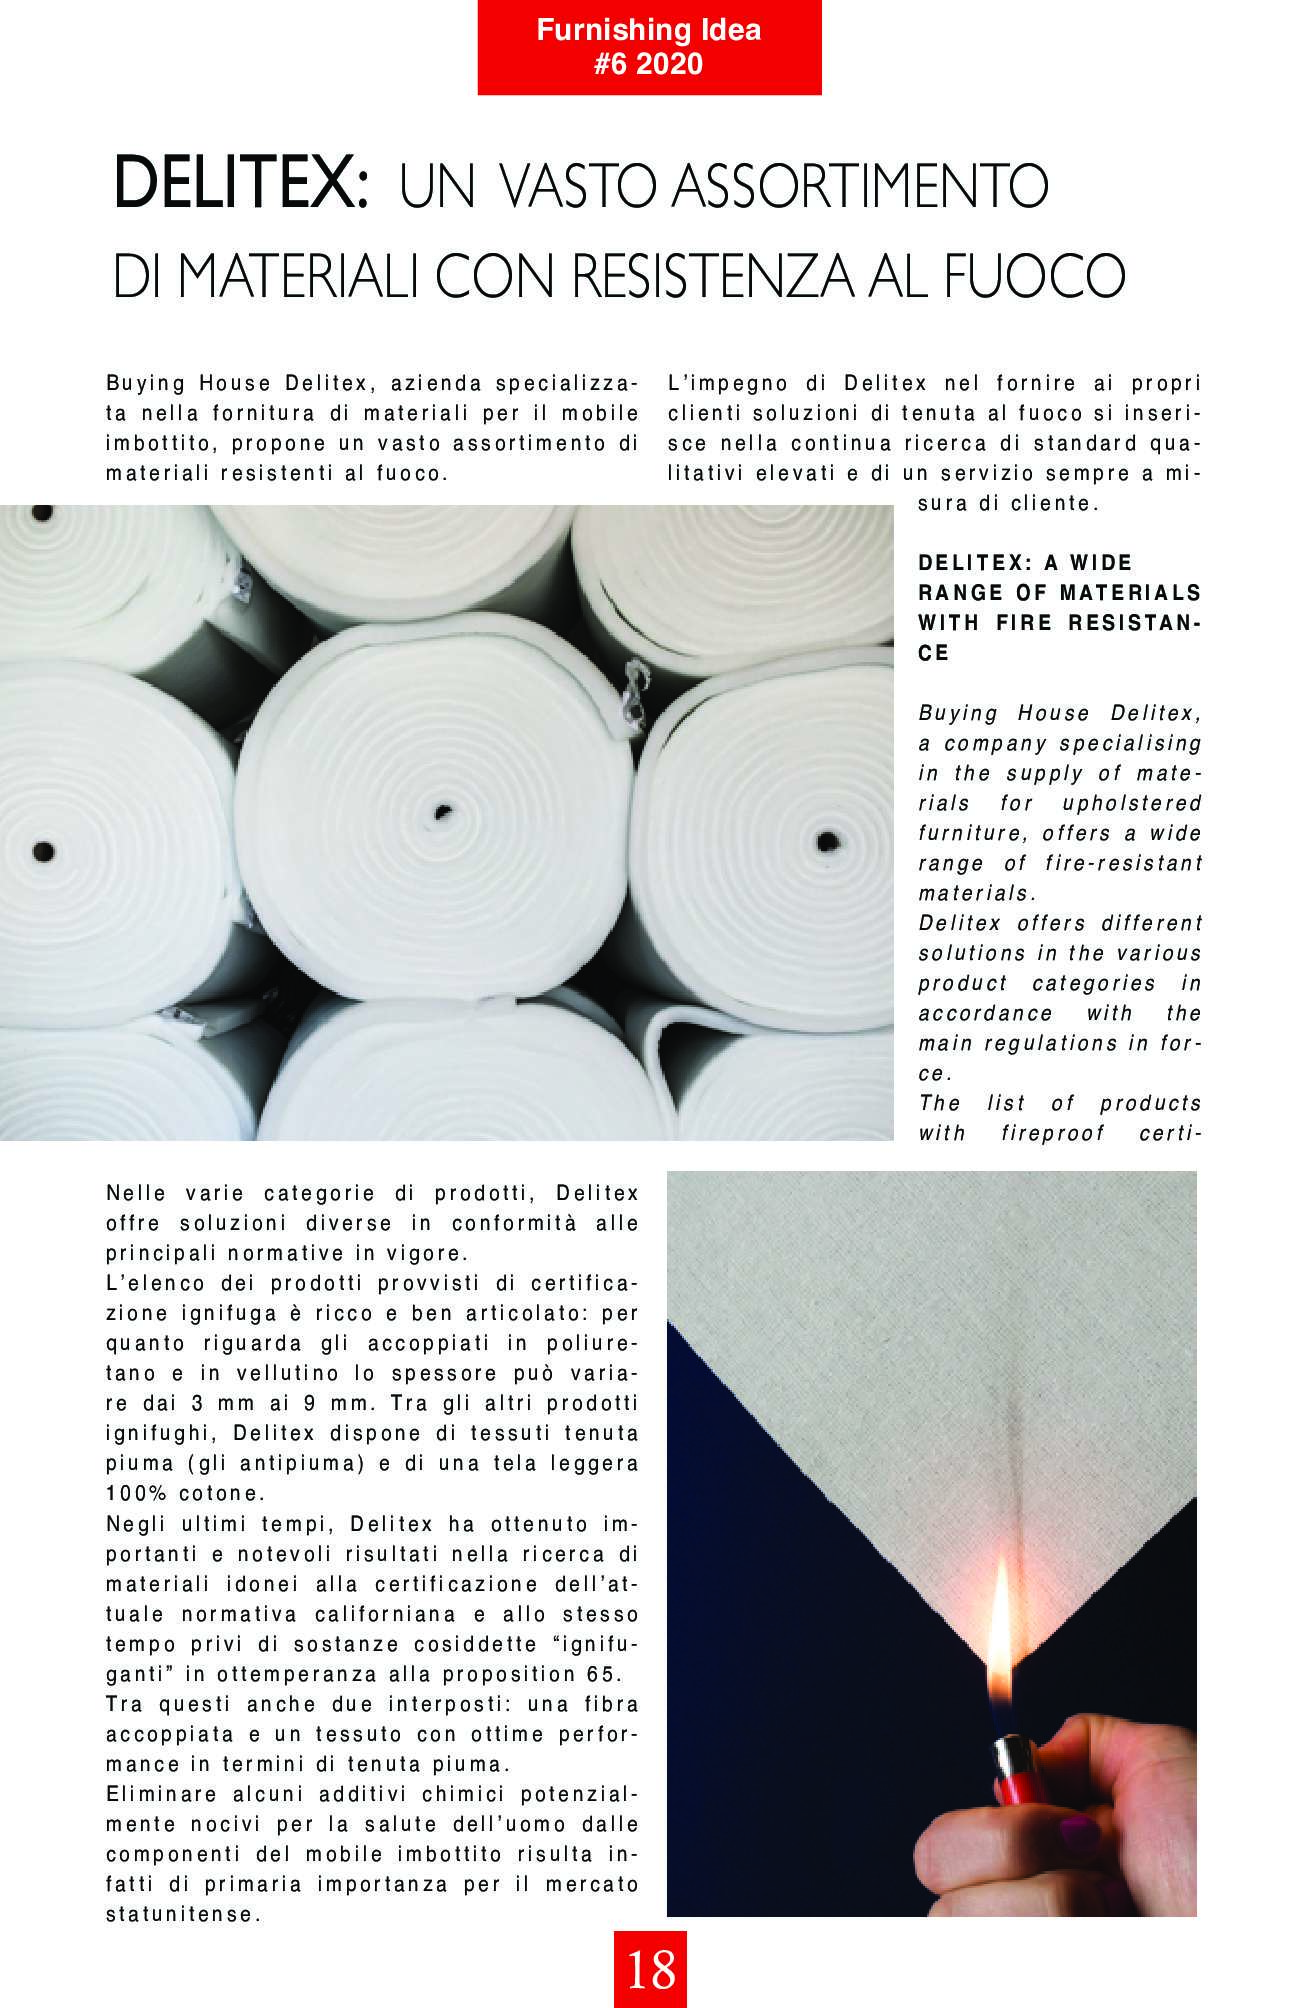 furnishingidea-6-2020_journal_22_017.jpg